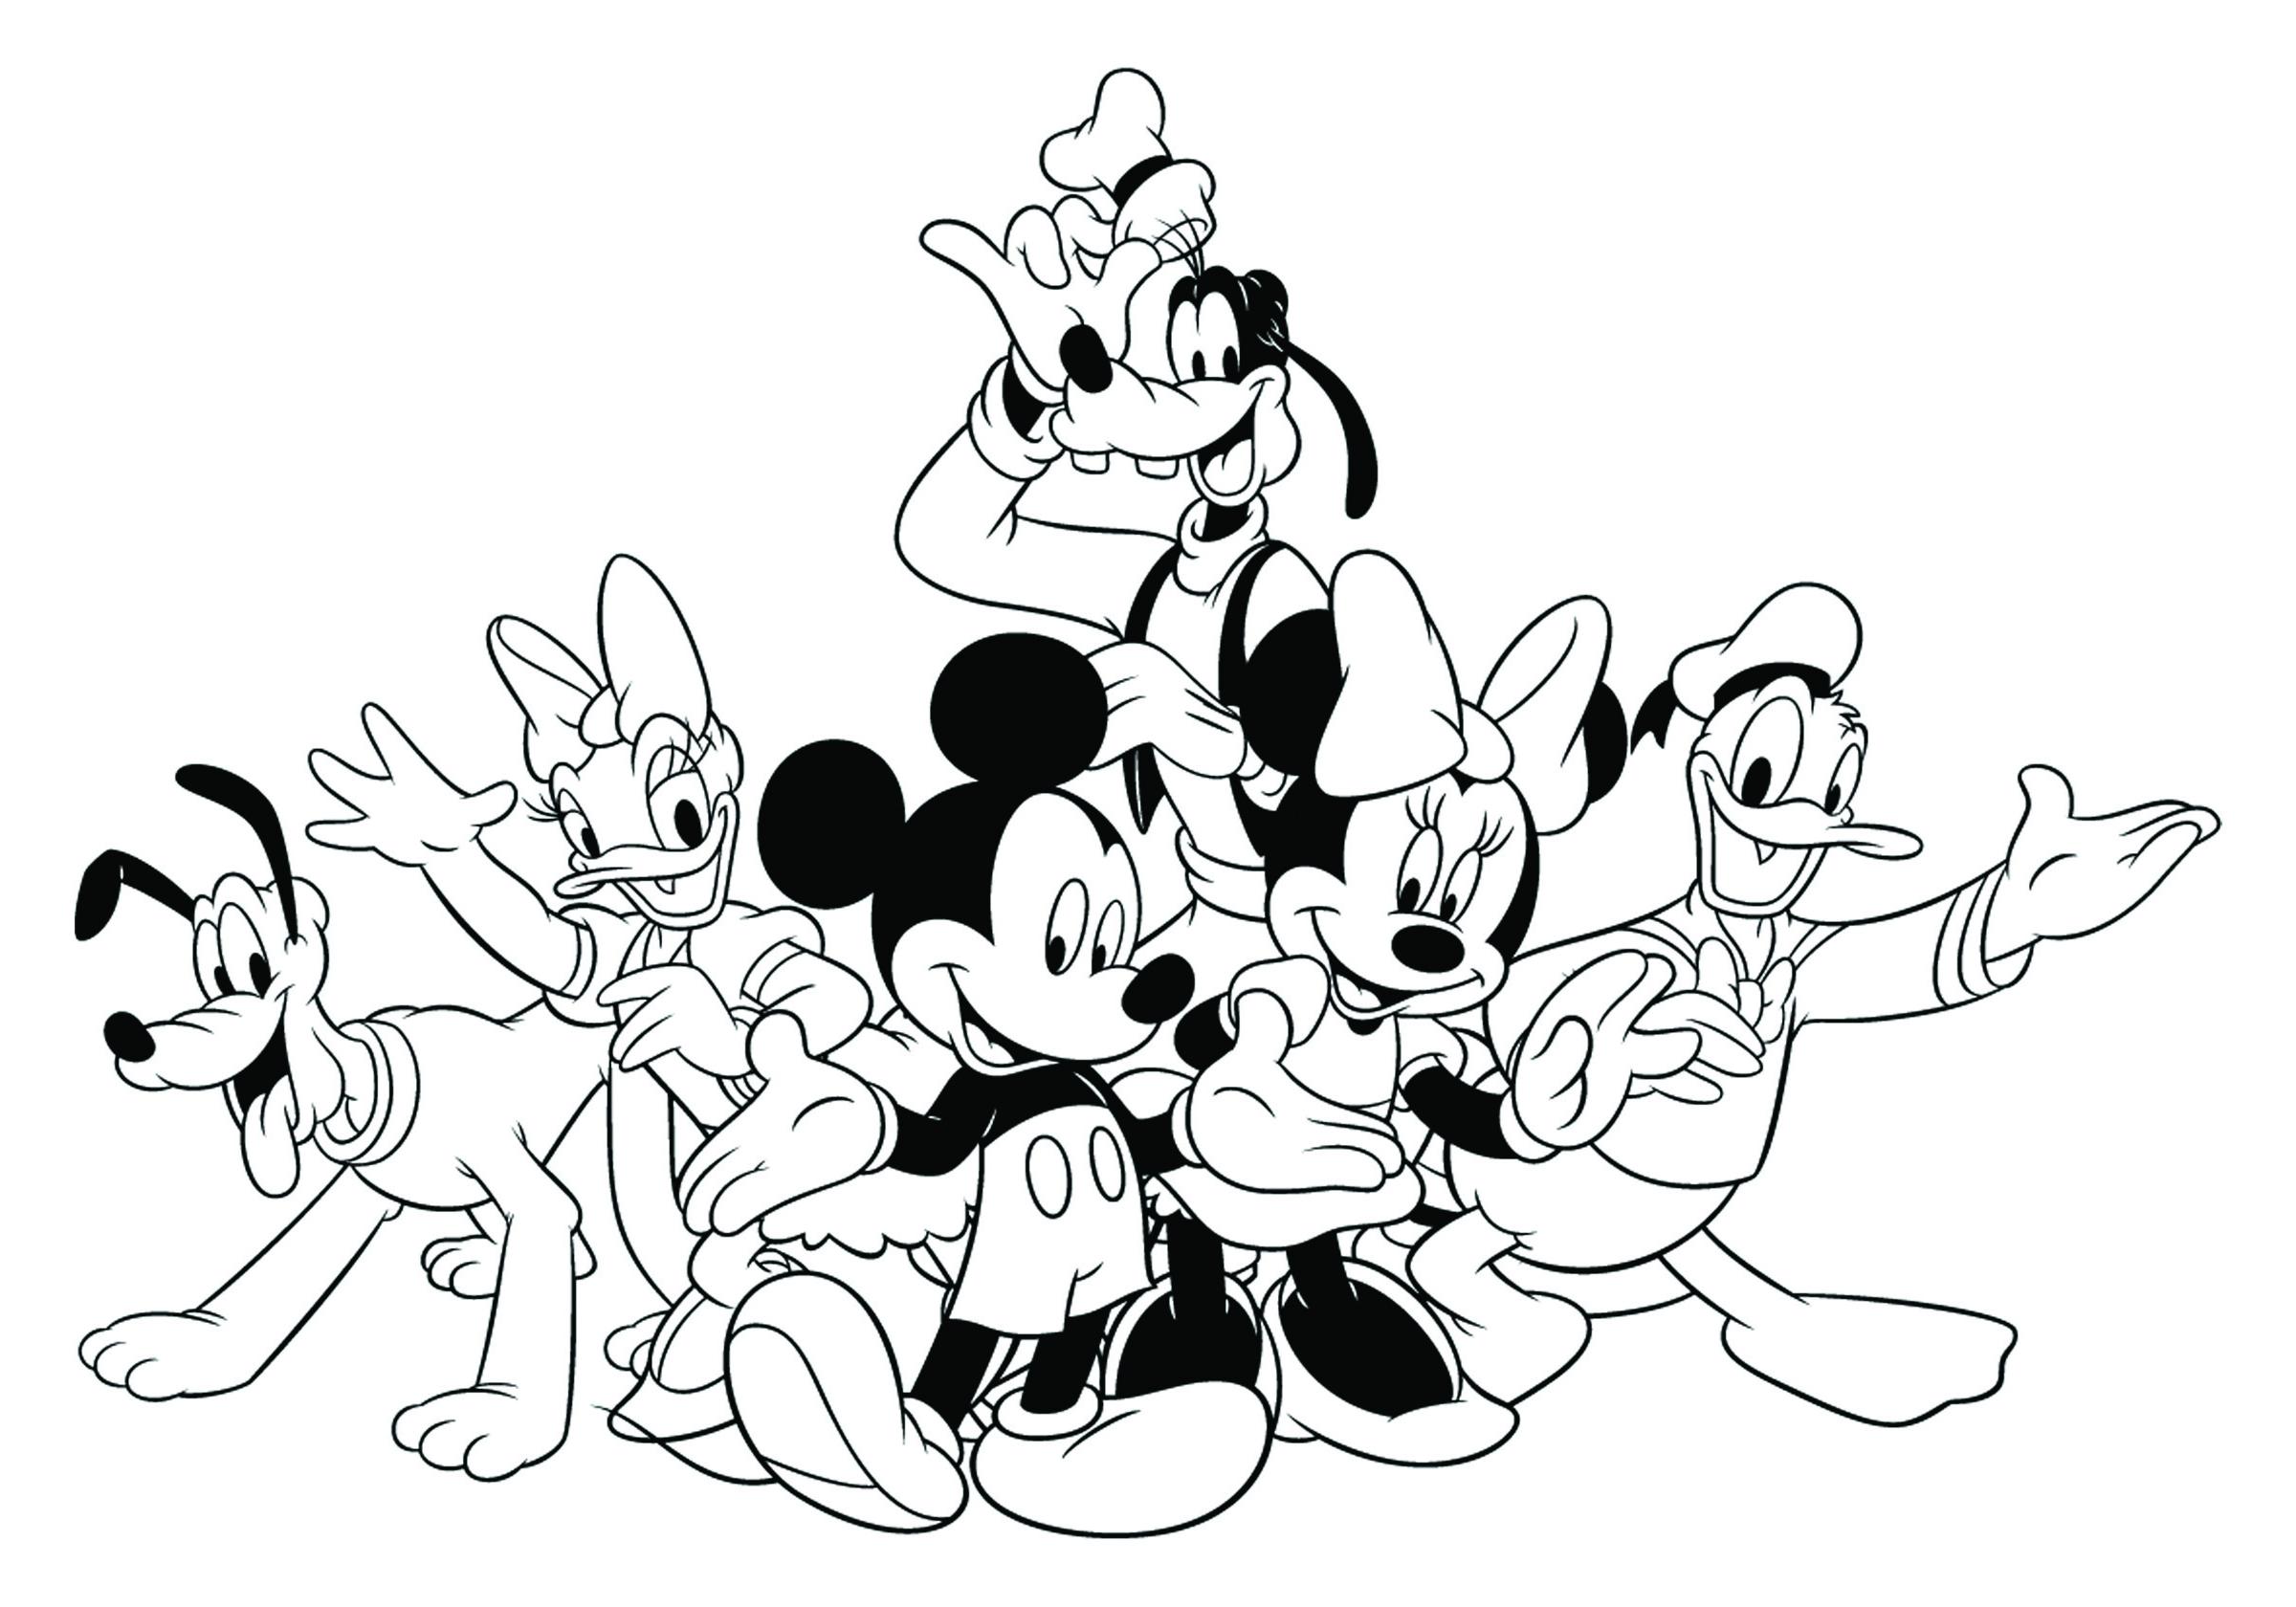 2400x1680 Disney Mickeys Typing Adventure Coloring Page Disney Family Mickey